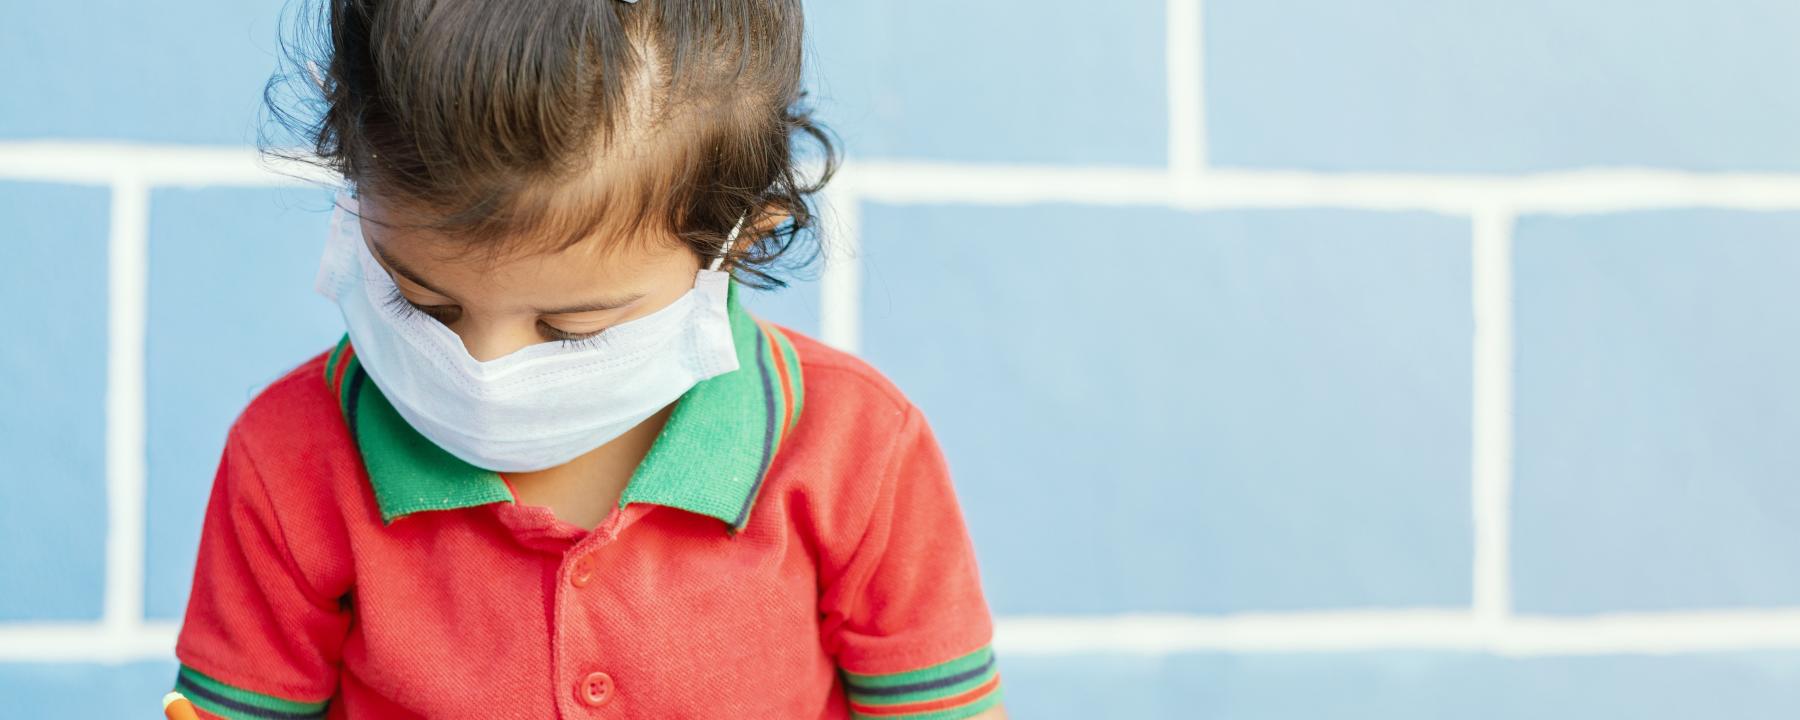 Children Often Carry More Coronavirus than Adults Do: Study